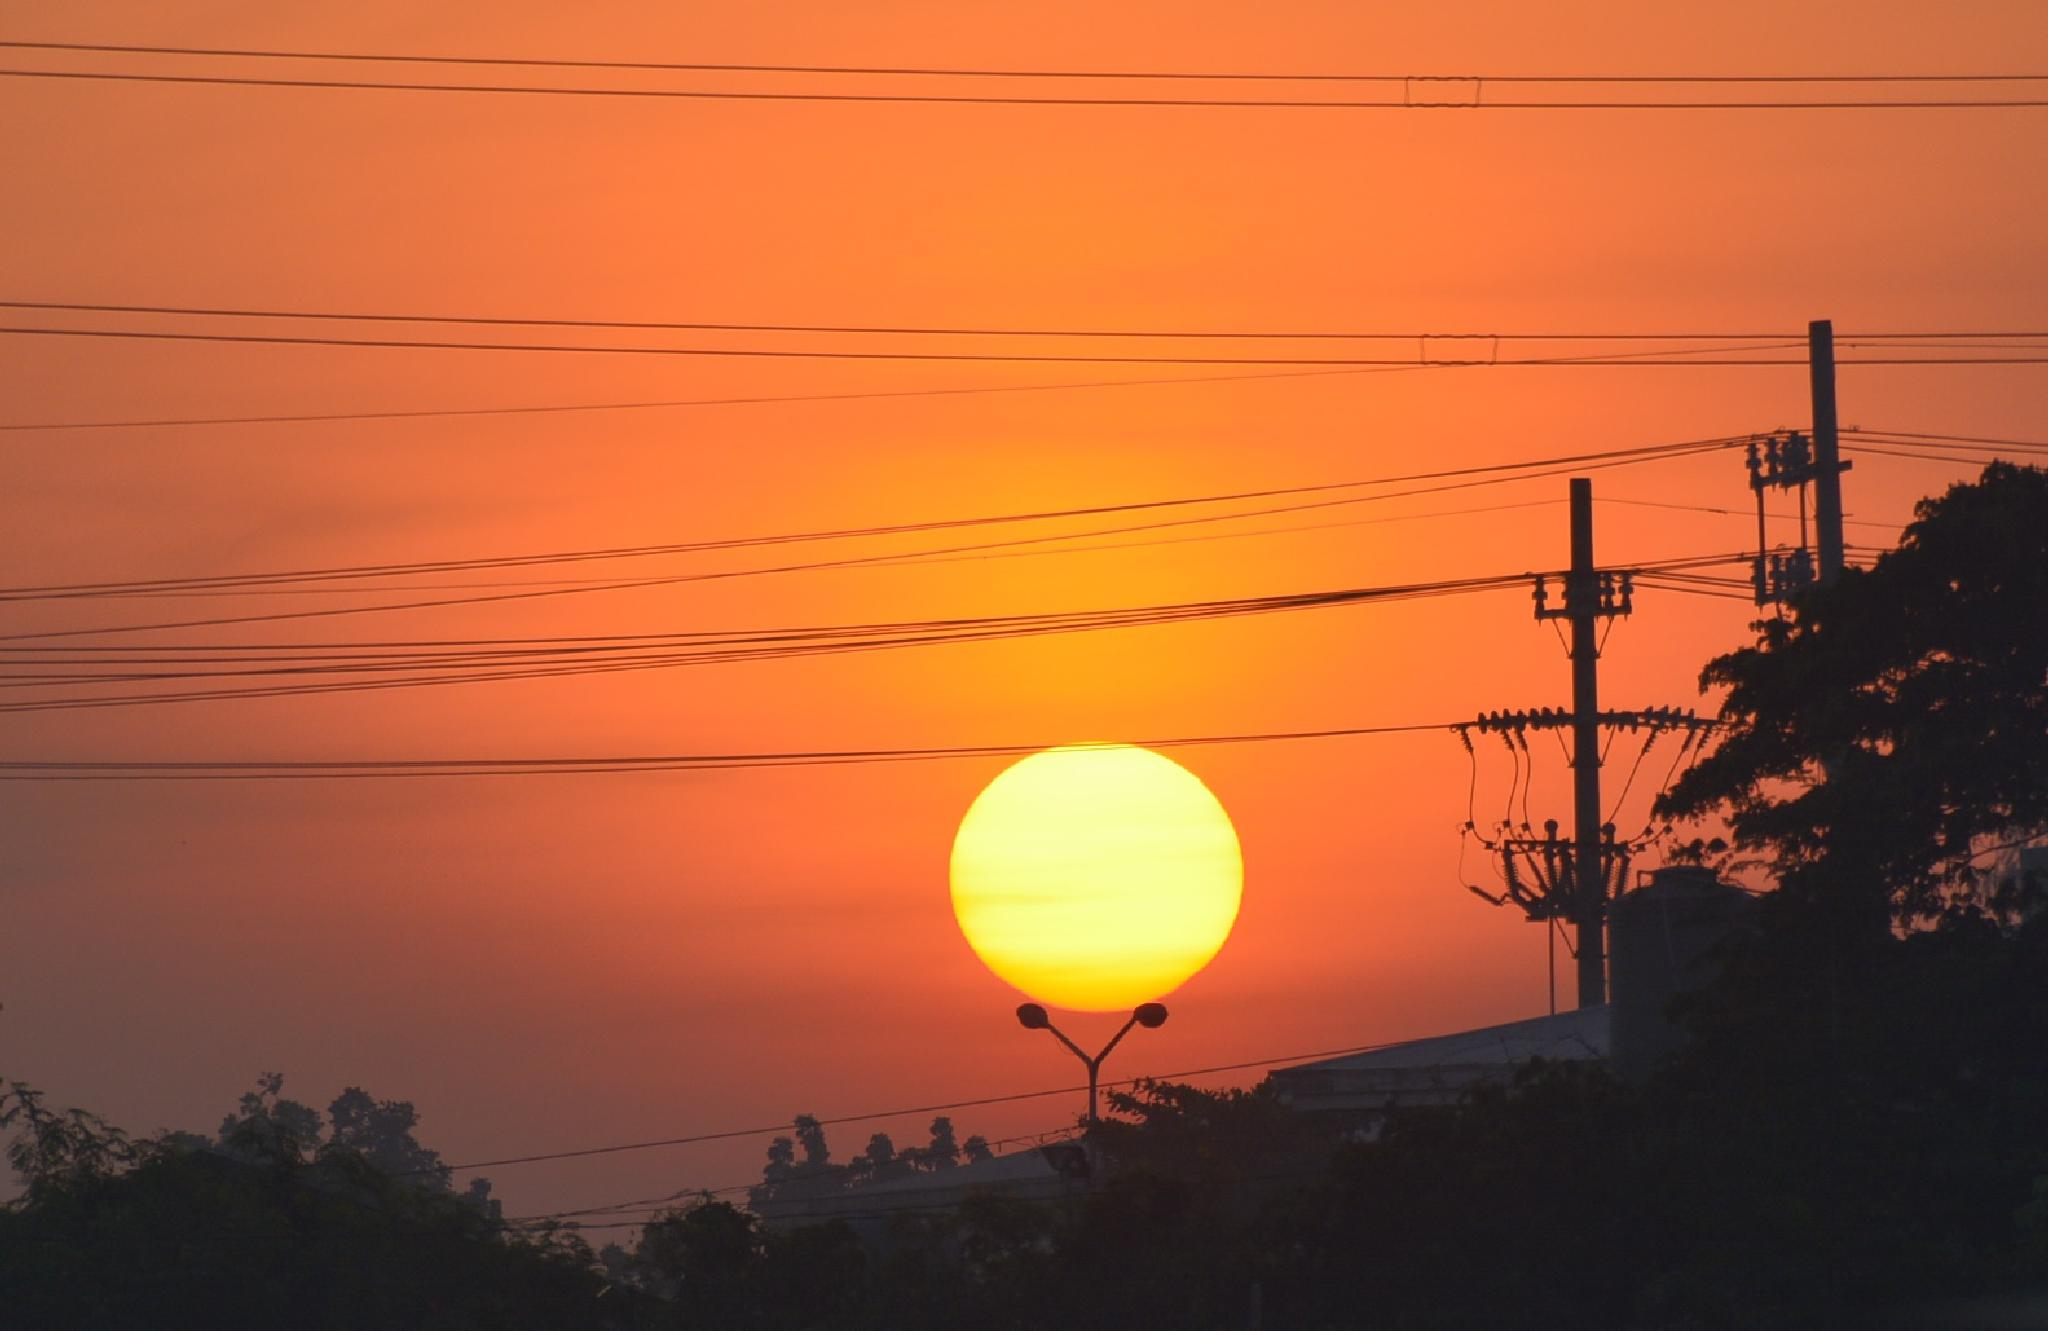 The power of the sun by virtel2